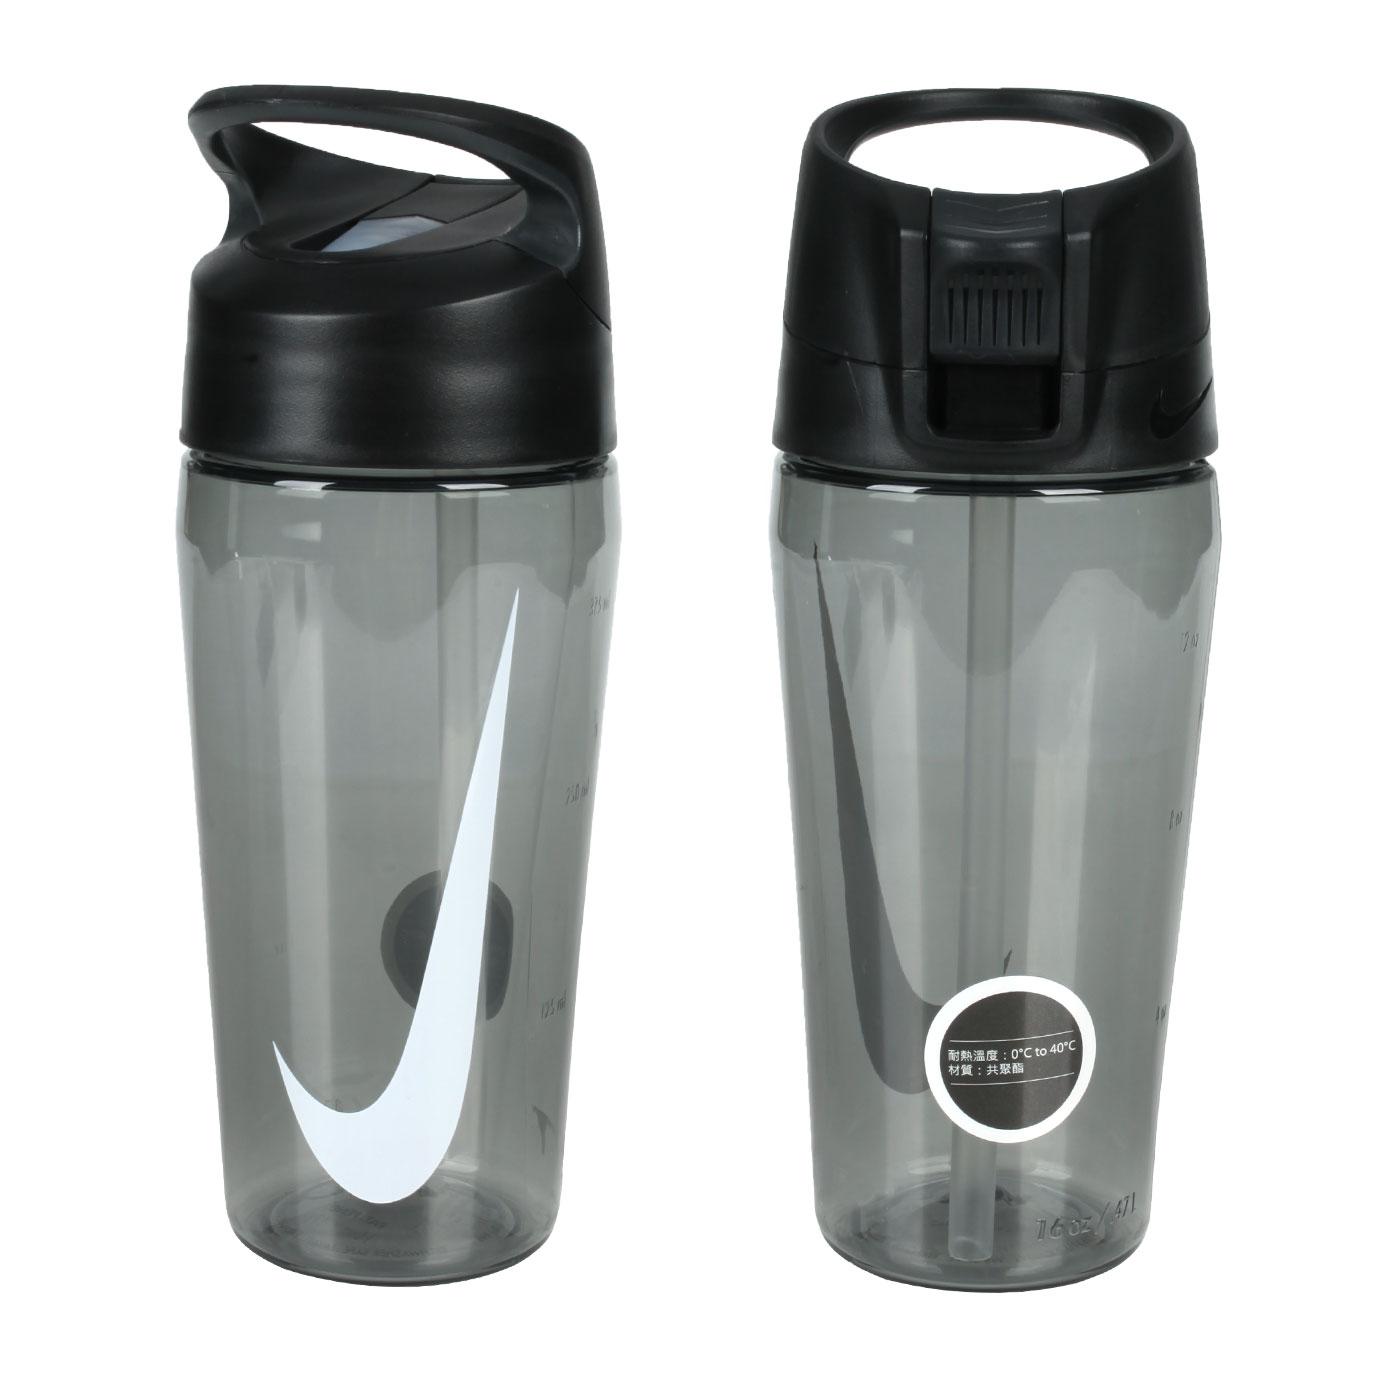 NIKE 16OZ 吸管水壺 N100078502516 - 透明黑白